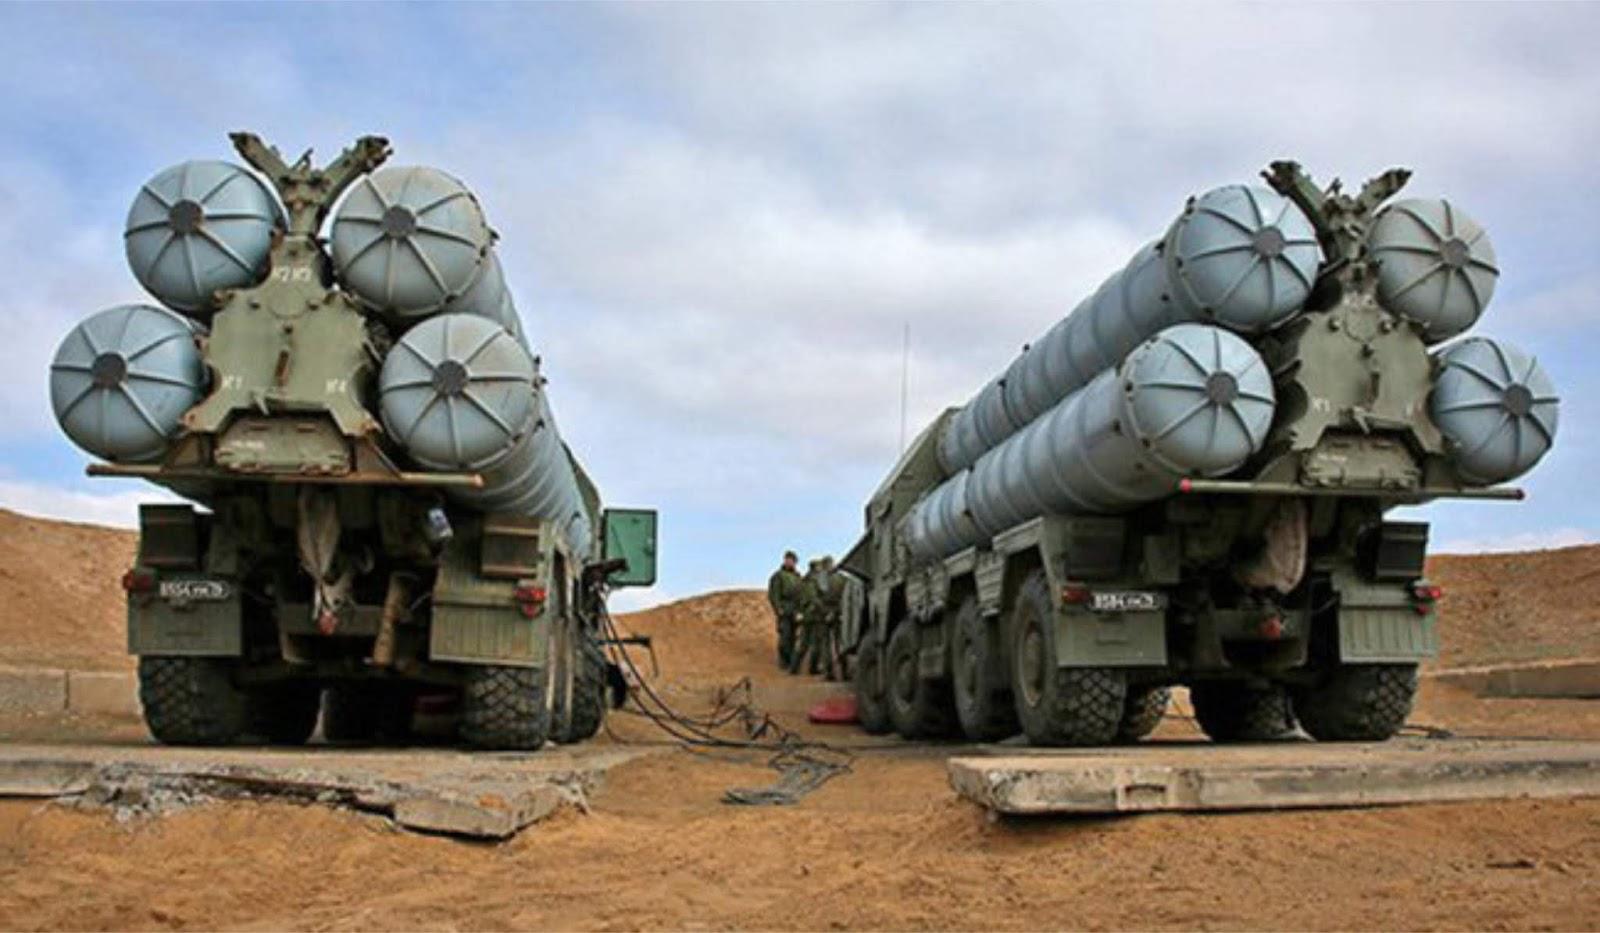 Sistem pertahanan udara S-300 sudah datang ke Suriah